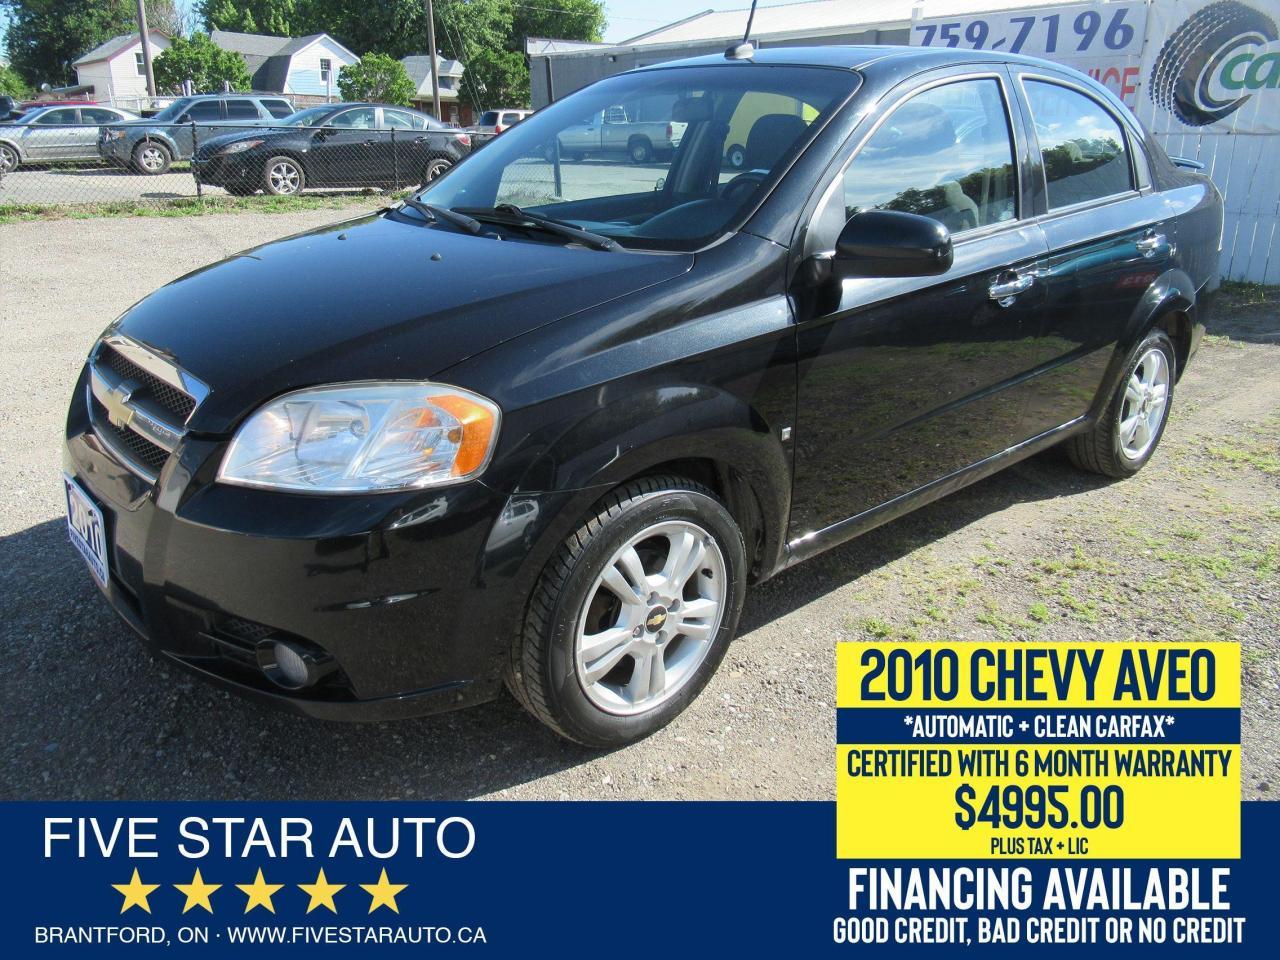 2010 Chevrolet Aveo LT *Clean Carfax* Certified w/ 6 Month Warranty